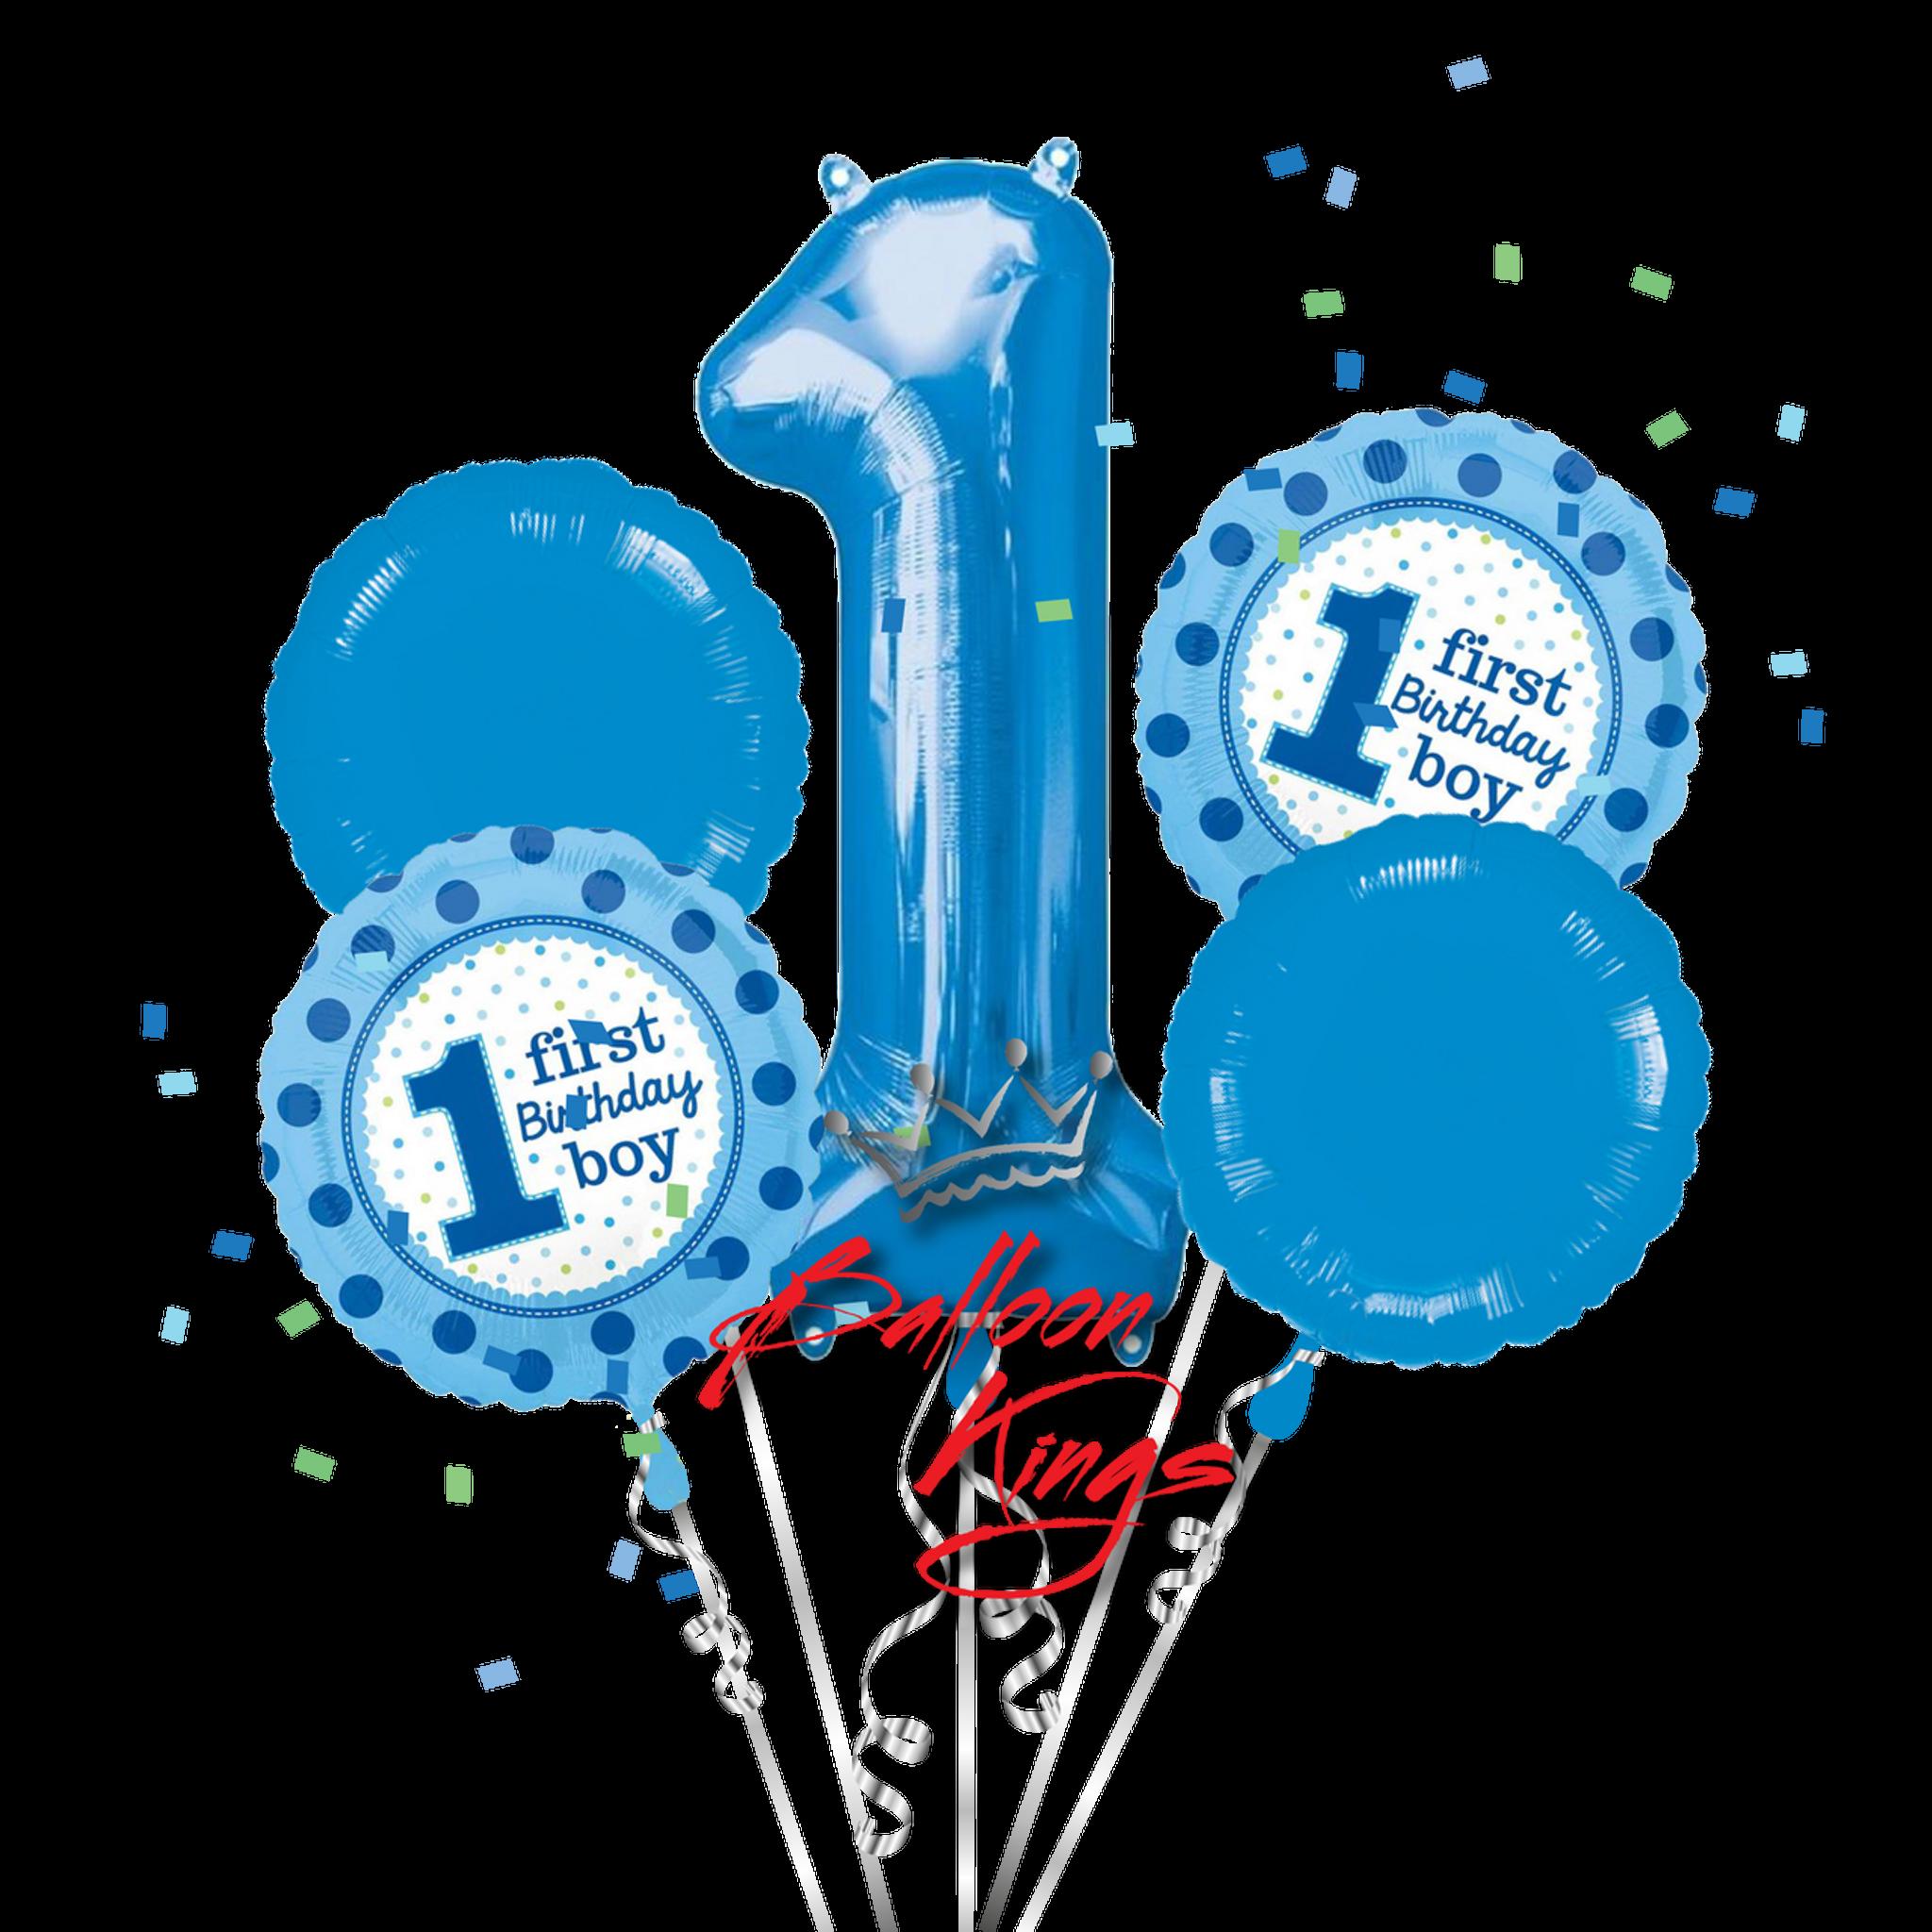 1st birthday boy bouquet balloon kings